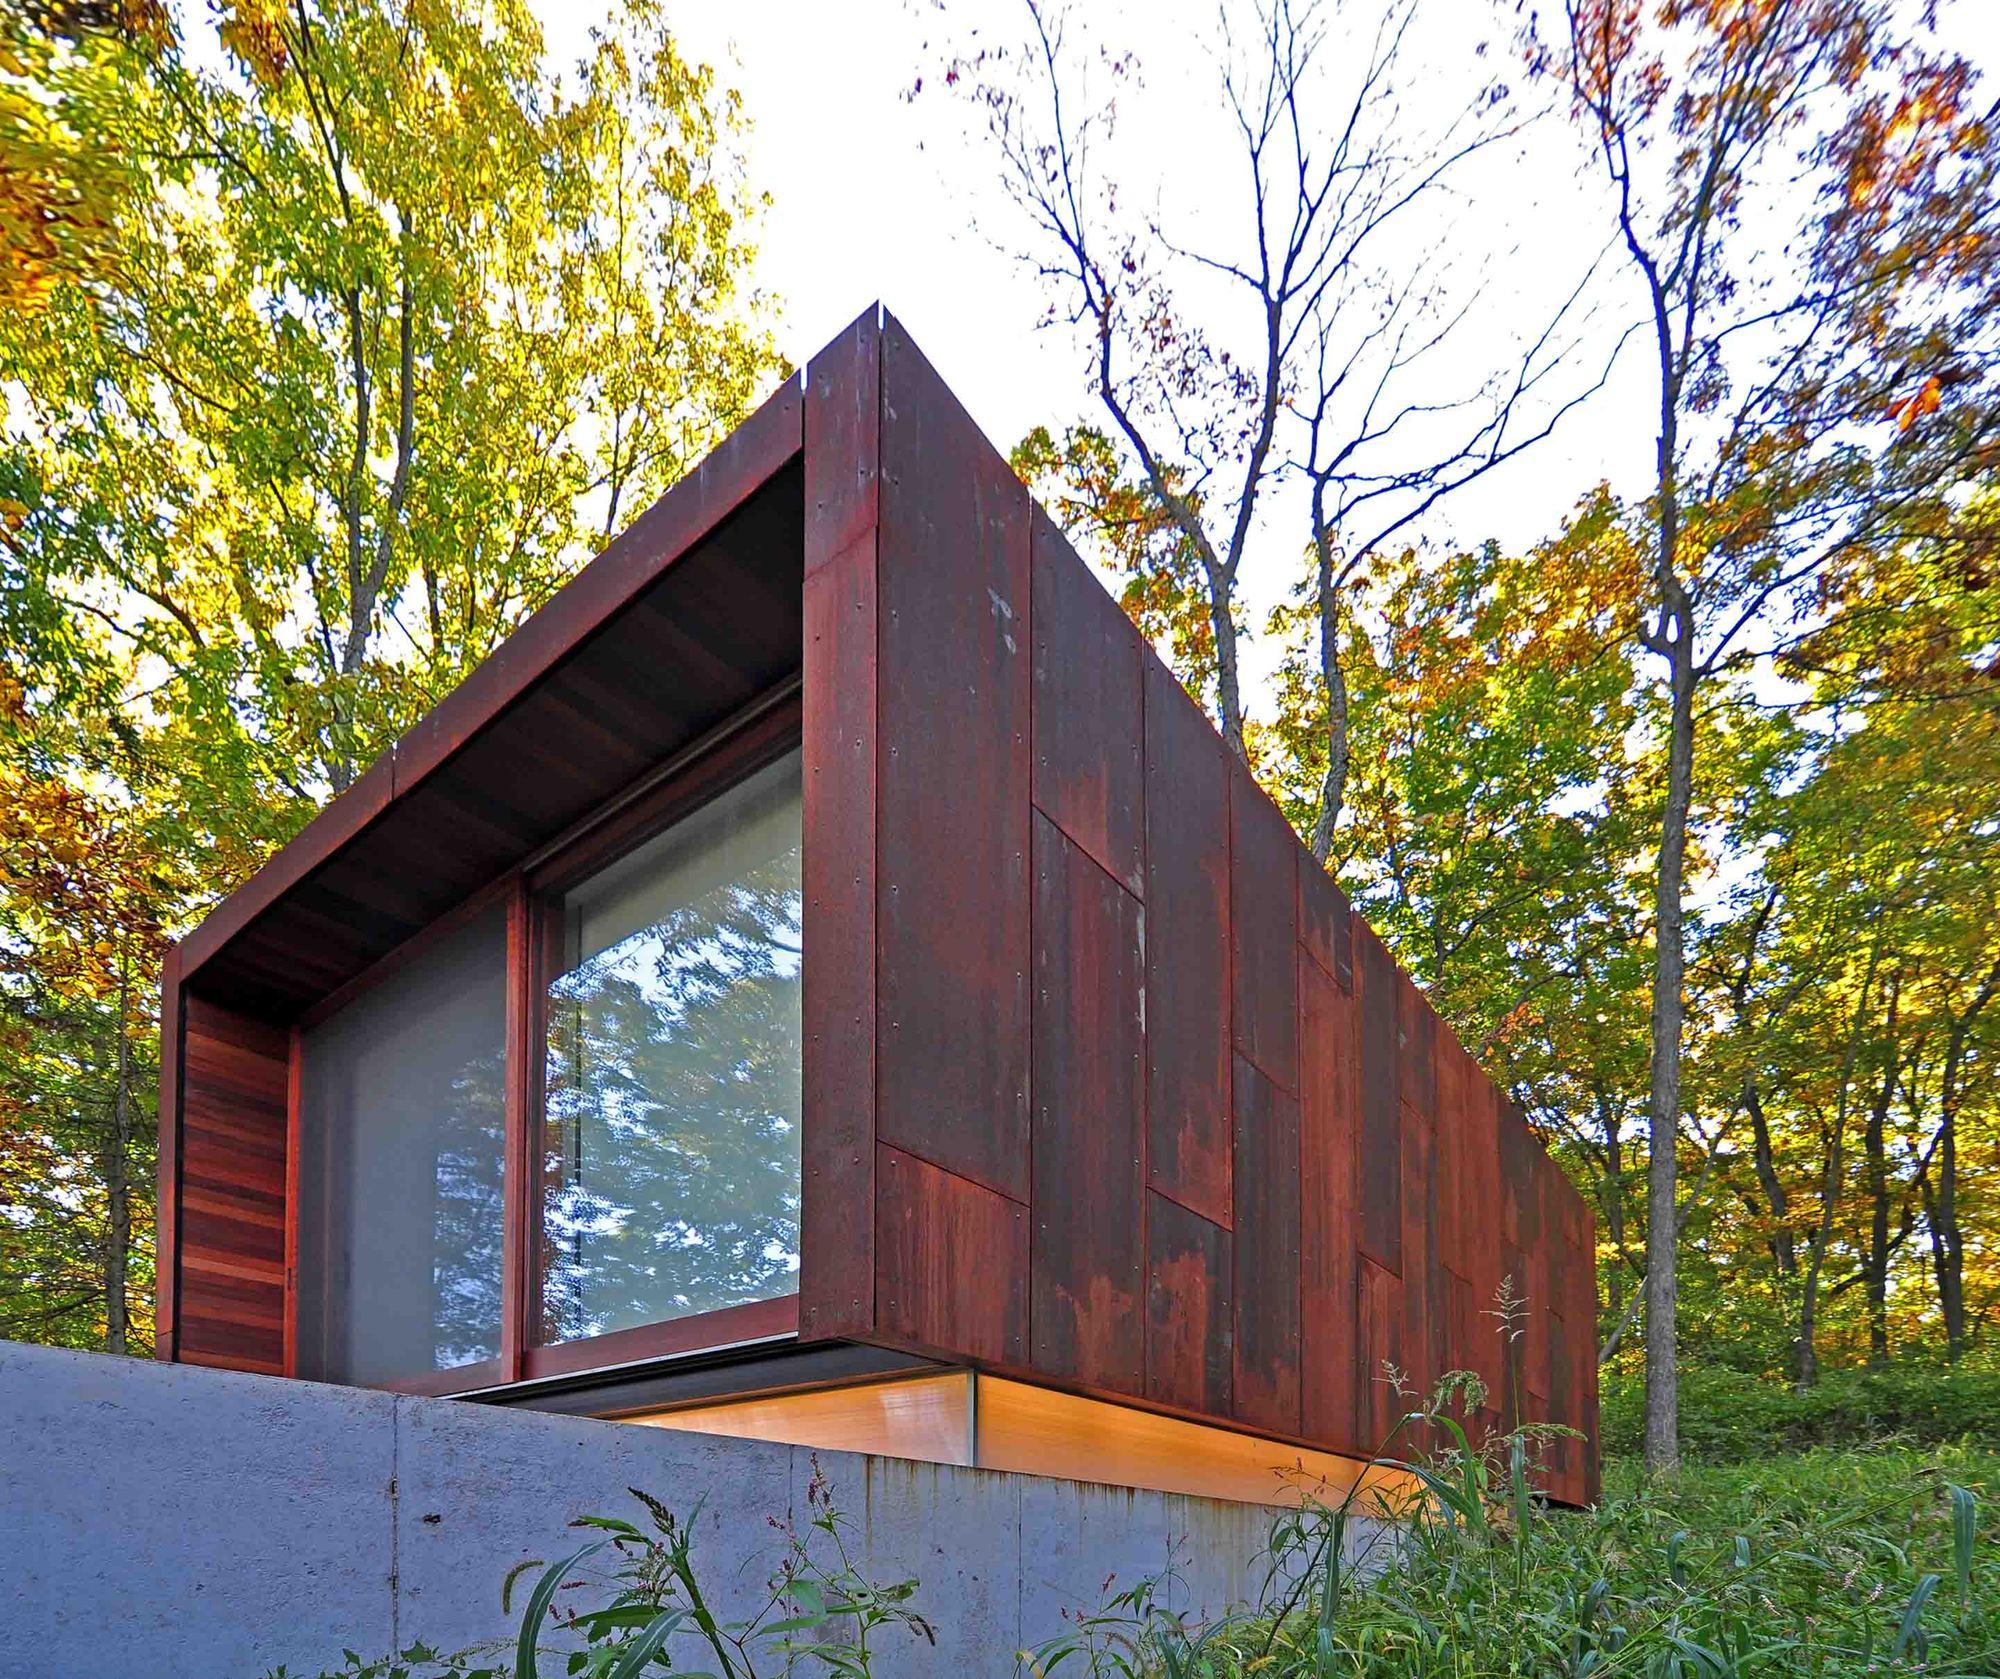 Estúdio para um Compositor / Johnsen Schmaling Architects, © John J. Macaulay